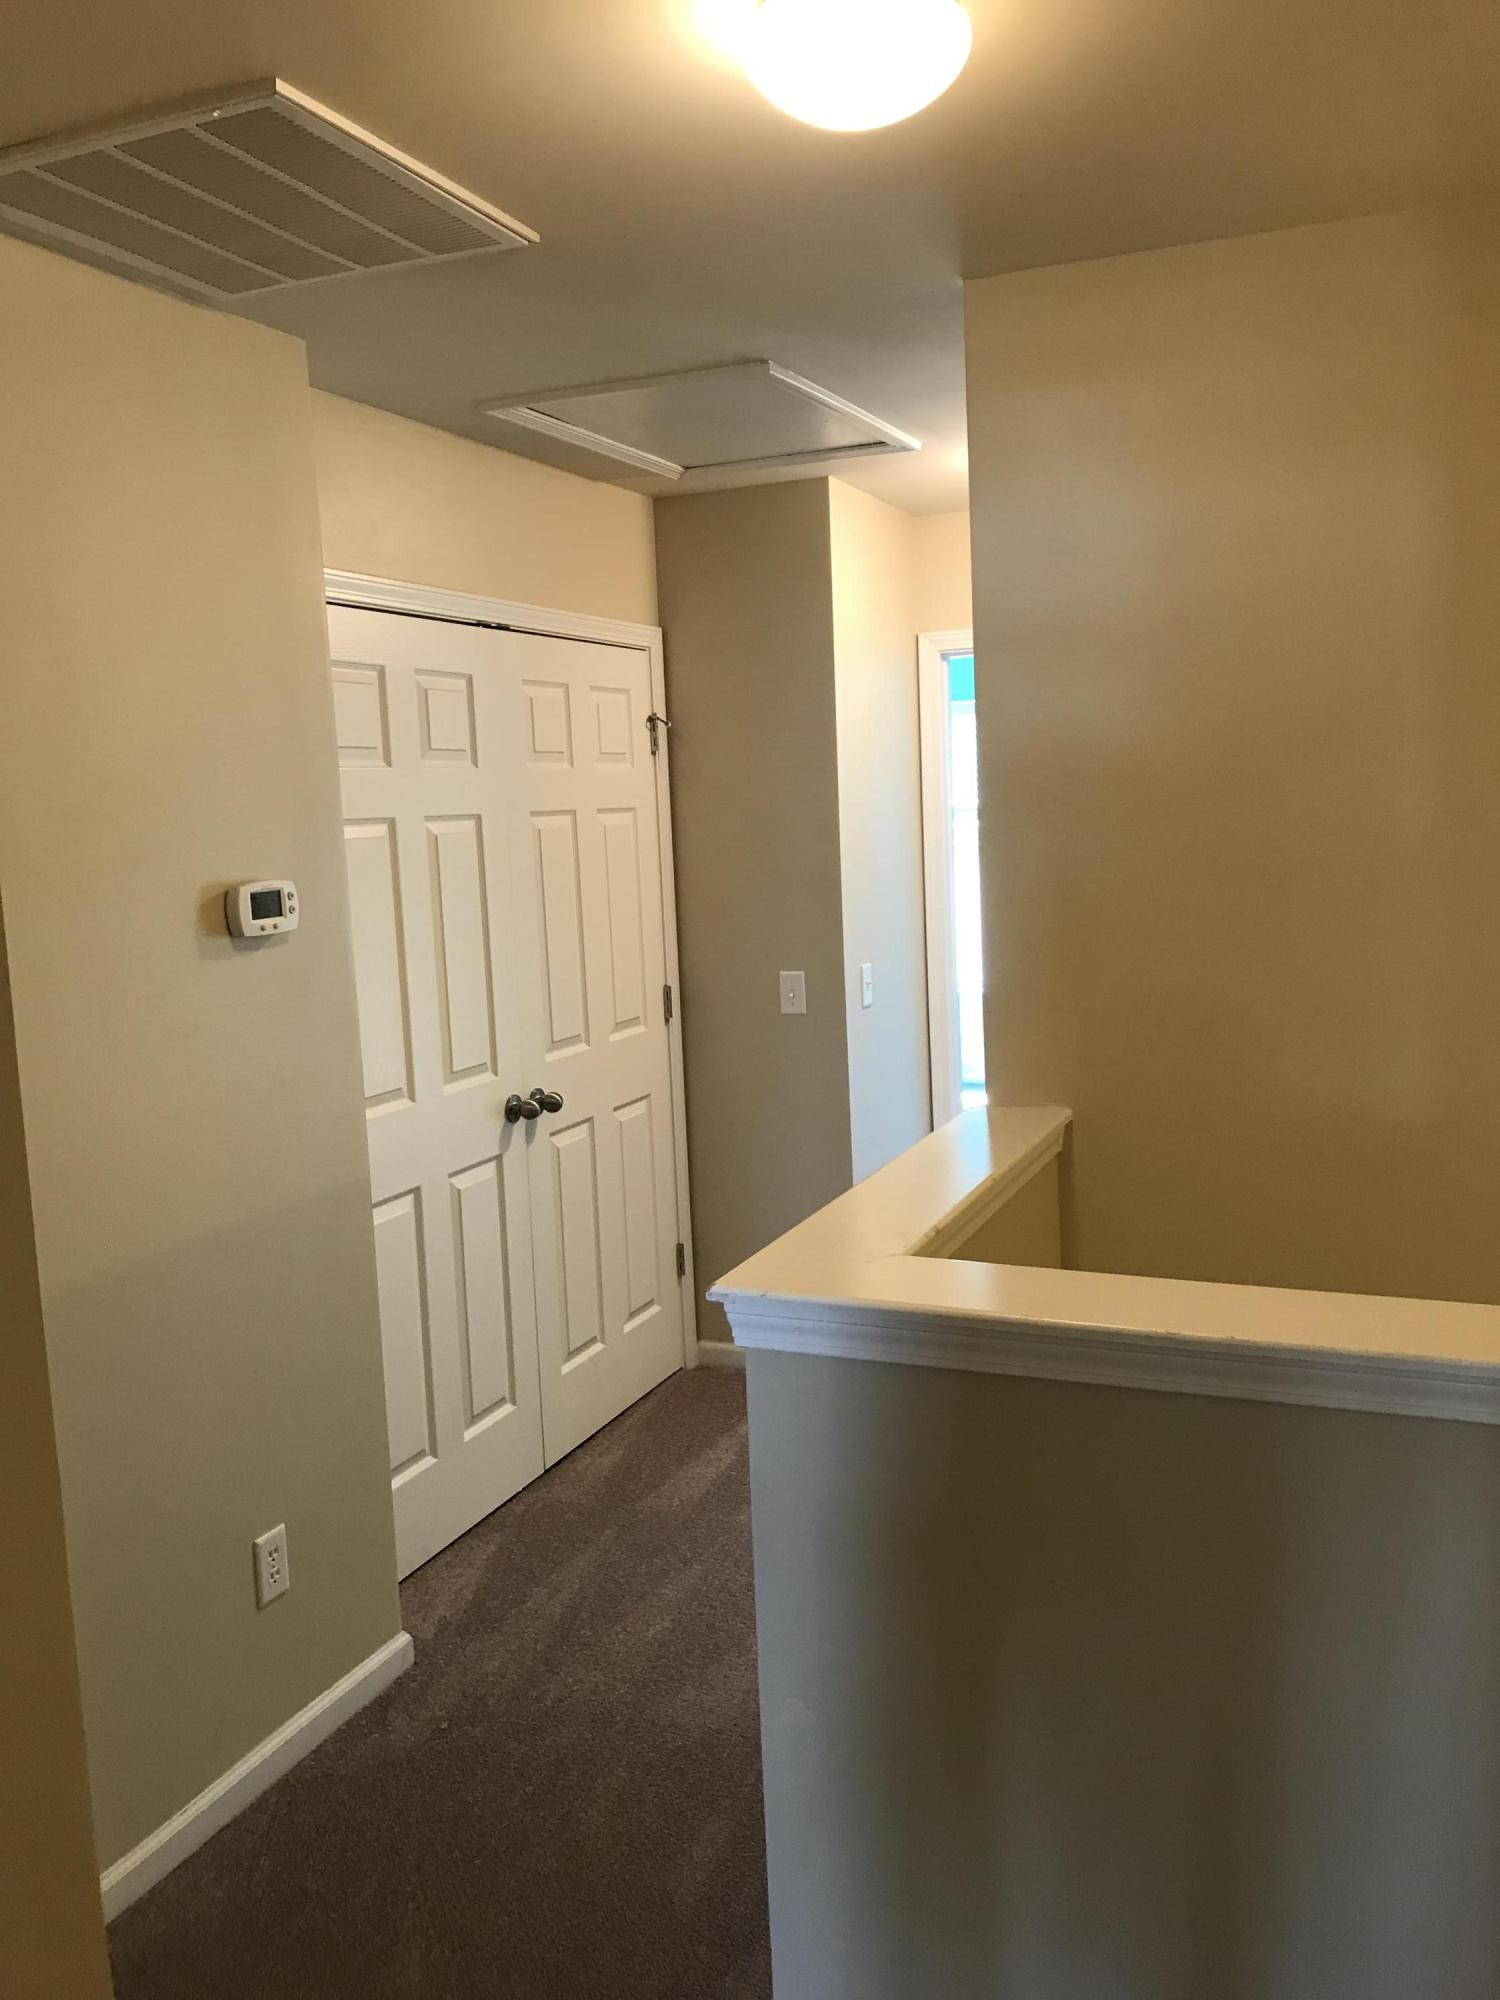 Cain Crossing Homes For Sale - 1006 Bennington, Charleston, SC - 6